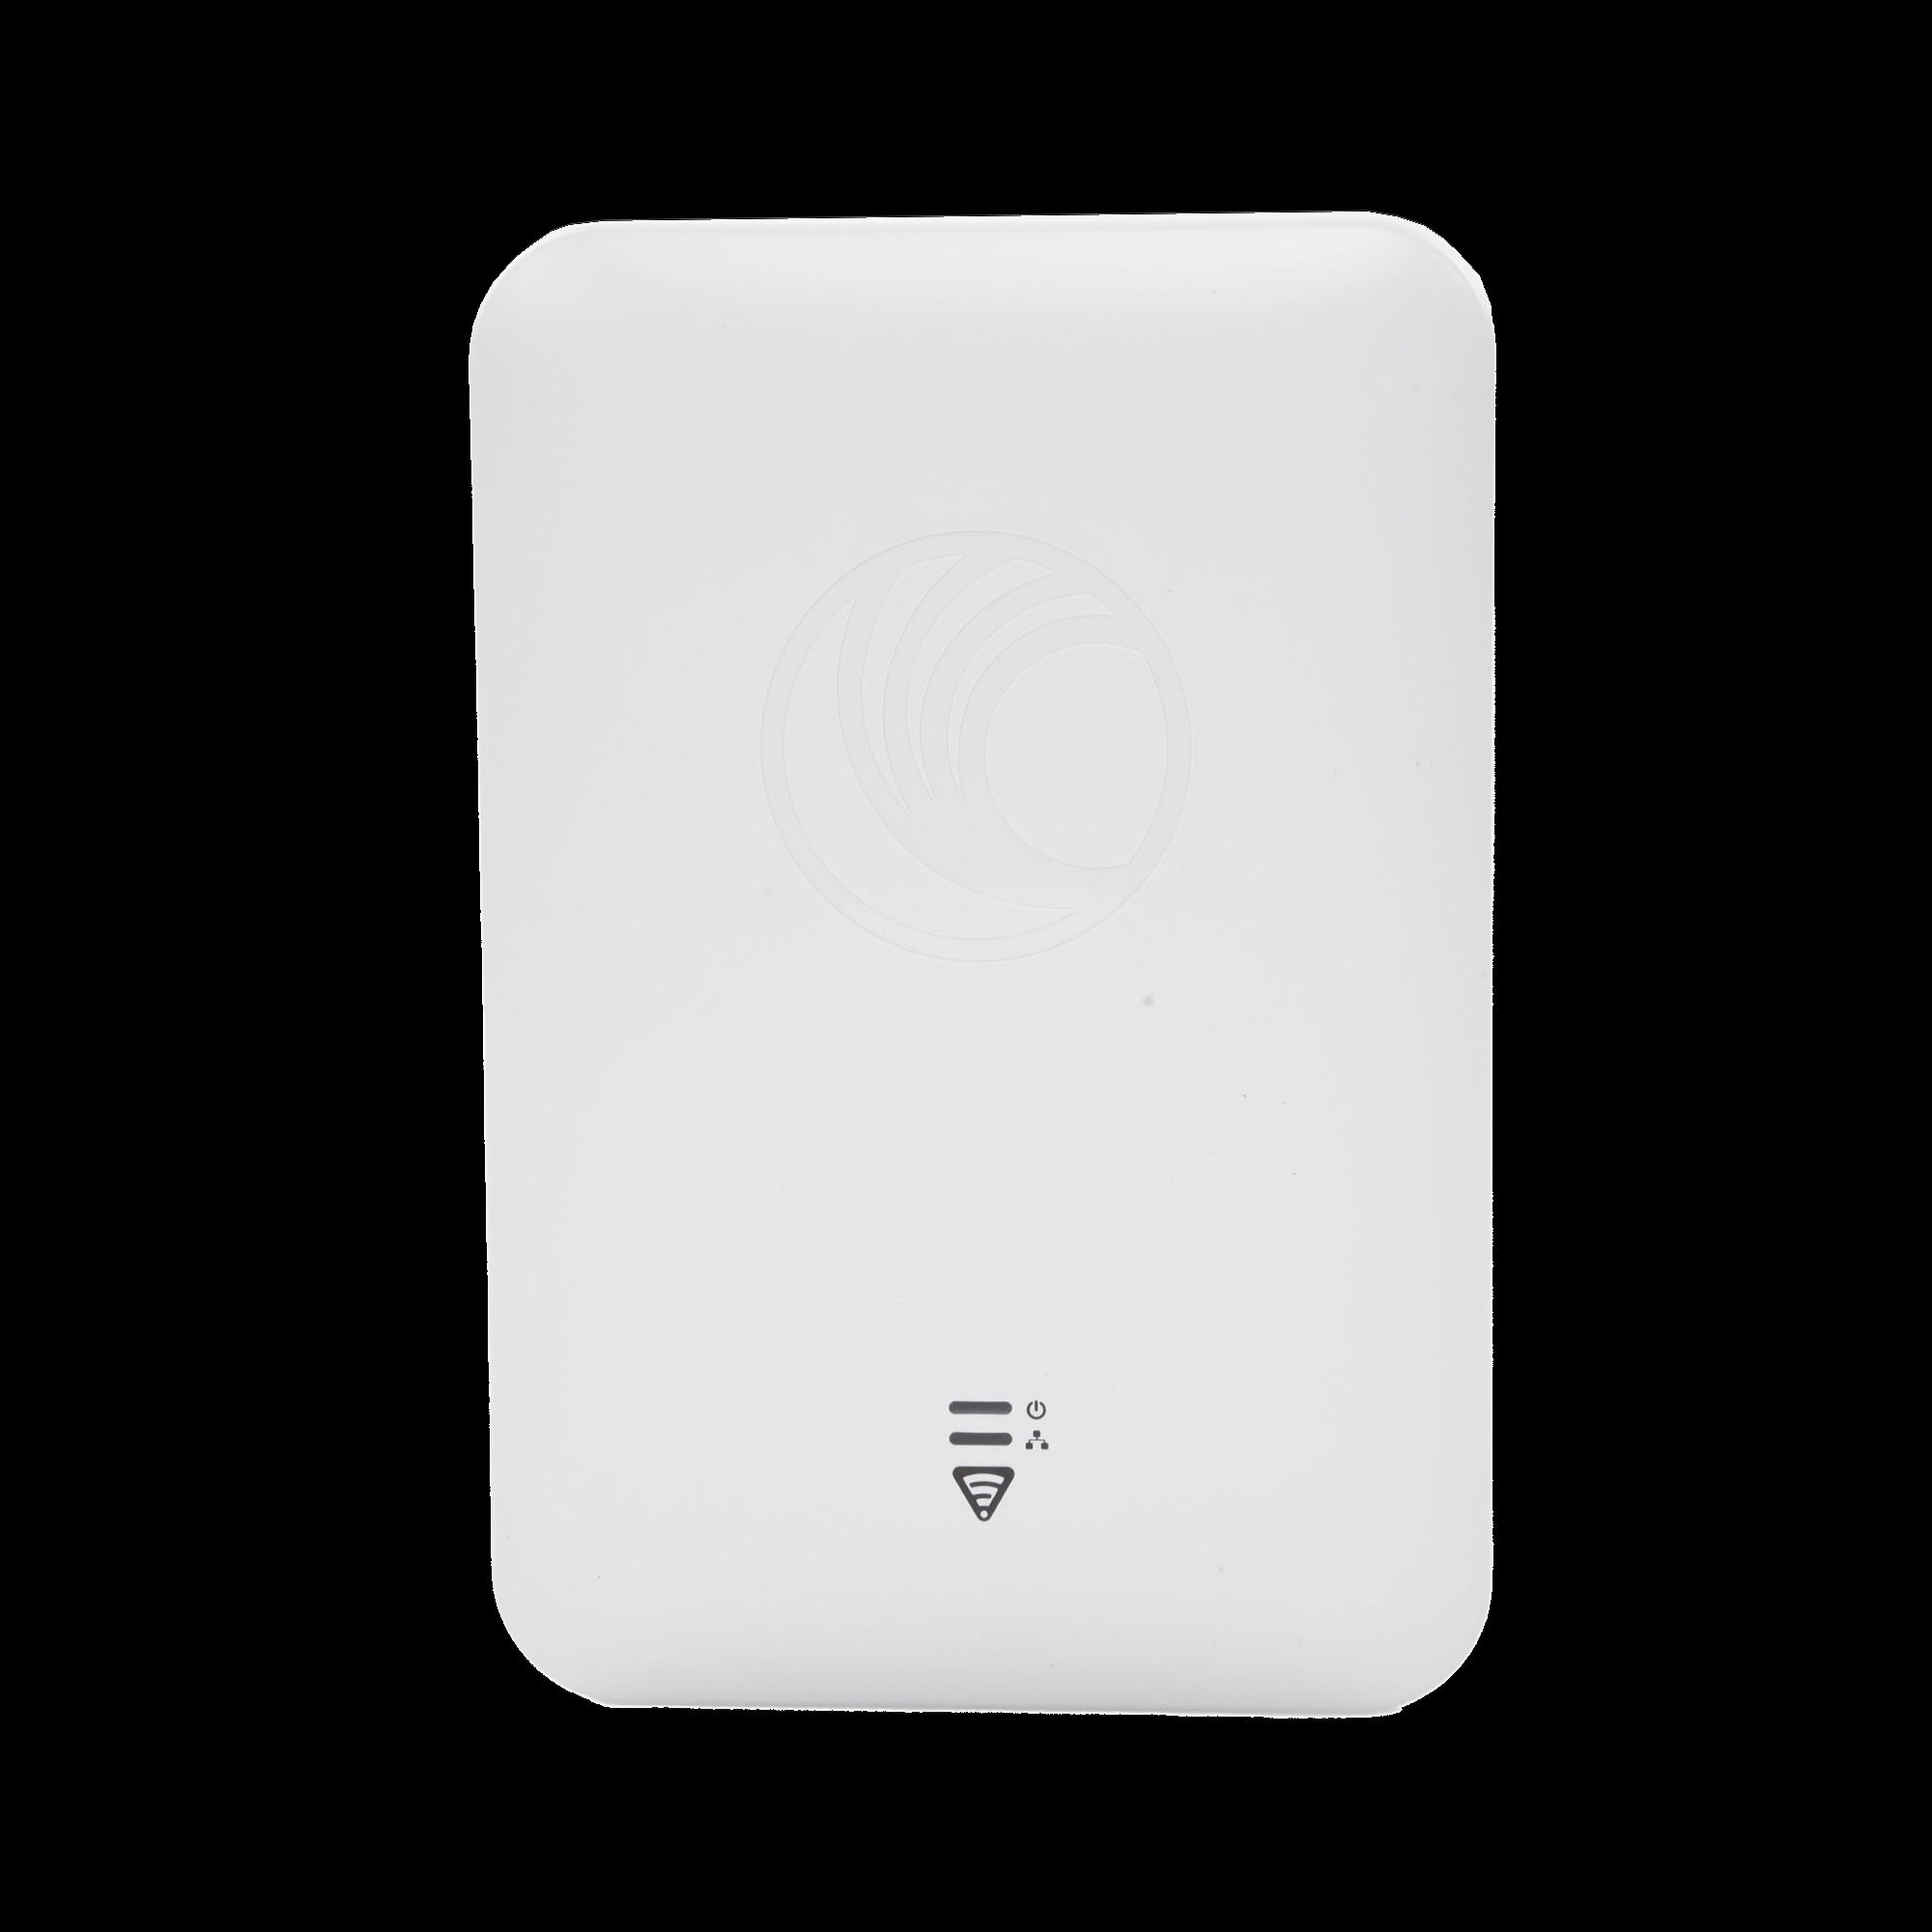 Access Point WiFi cnPilot e501S para exterior, IP67 grado industrial, Filtros para coexistencia con redes LTE, doble banda, antena sectorial 90-120 grados y puerto PoE secundario